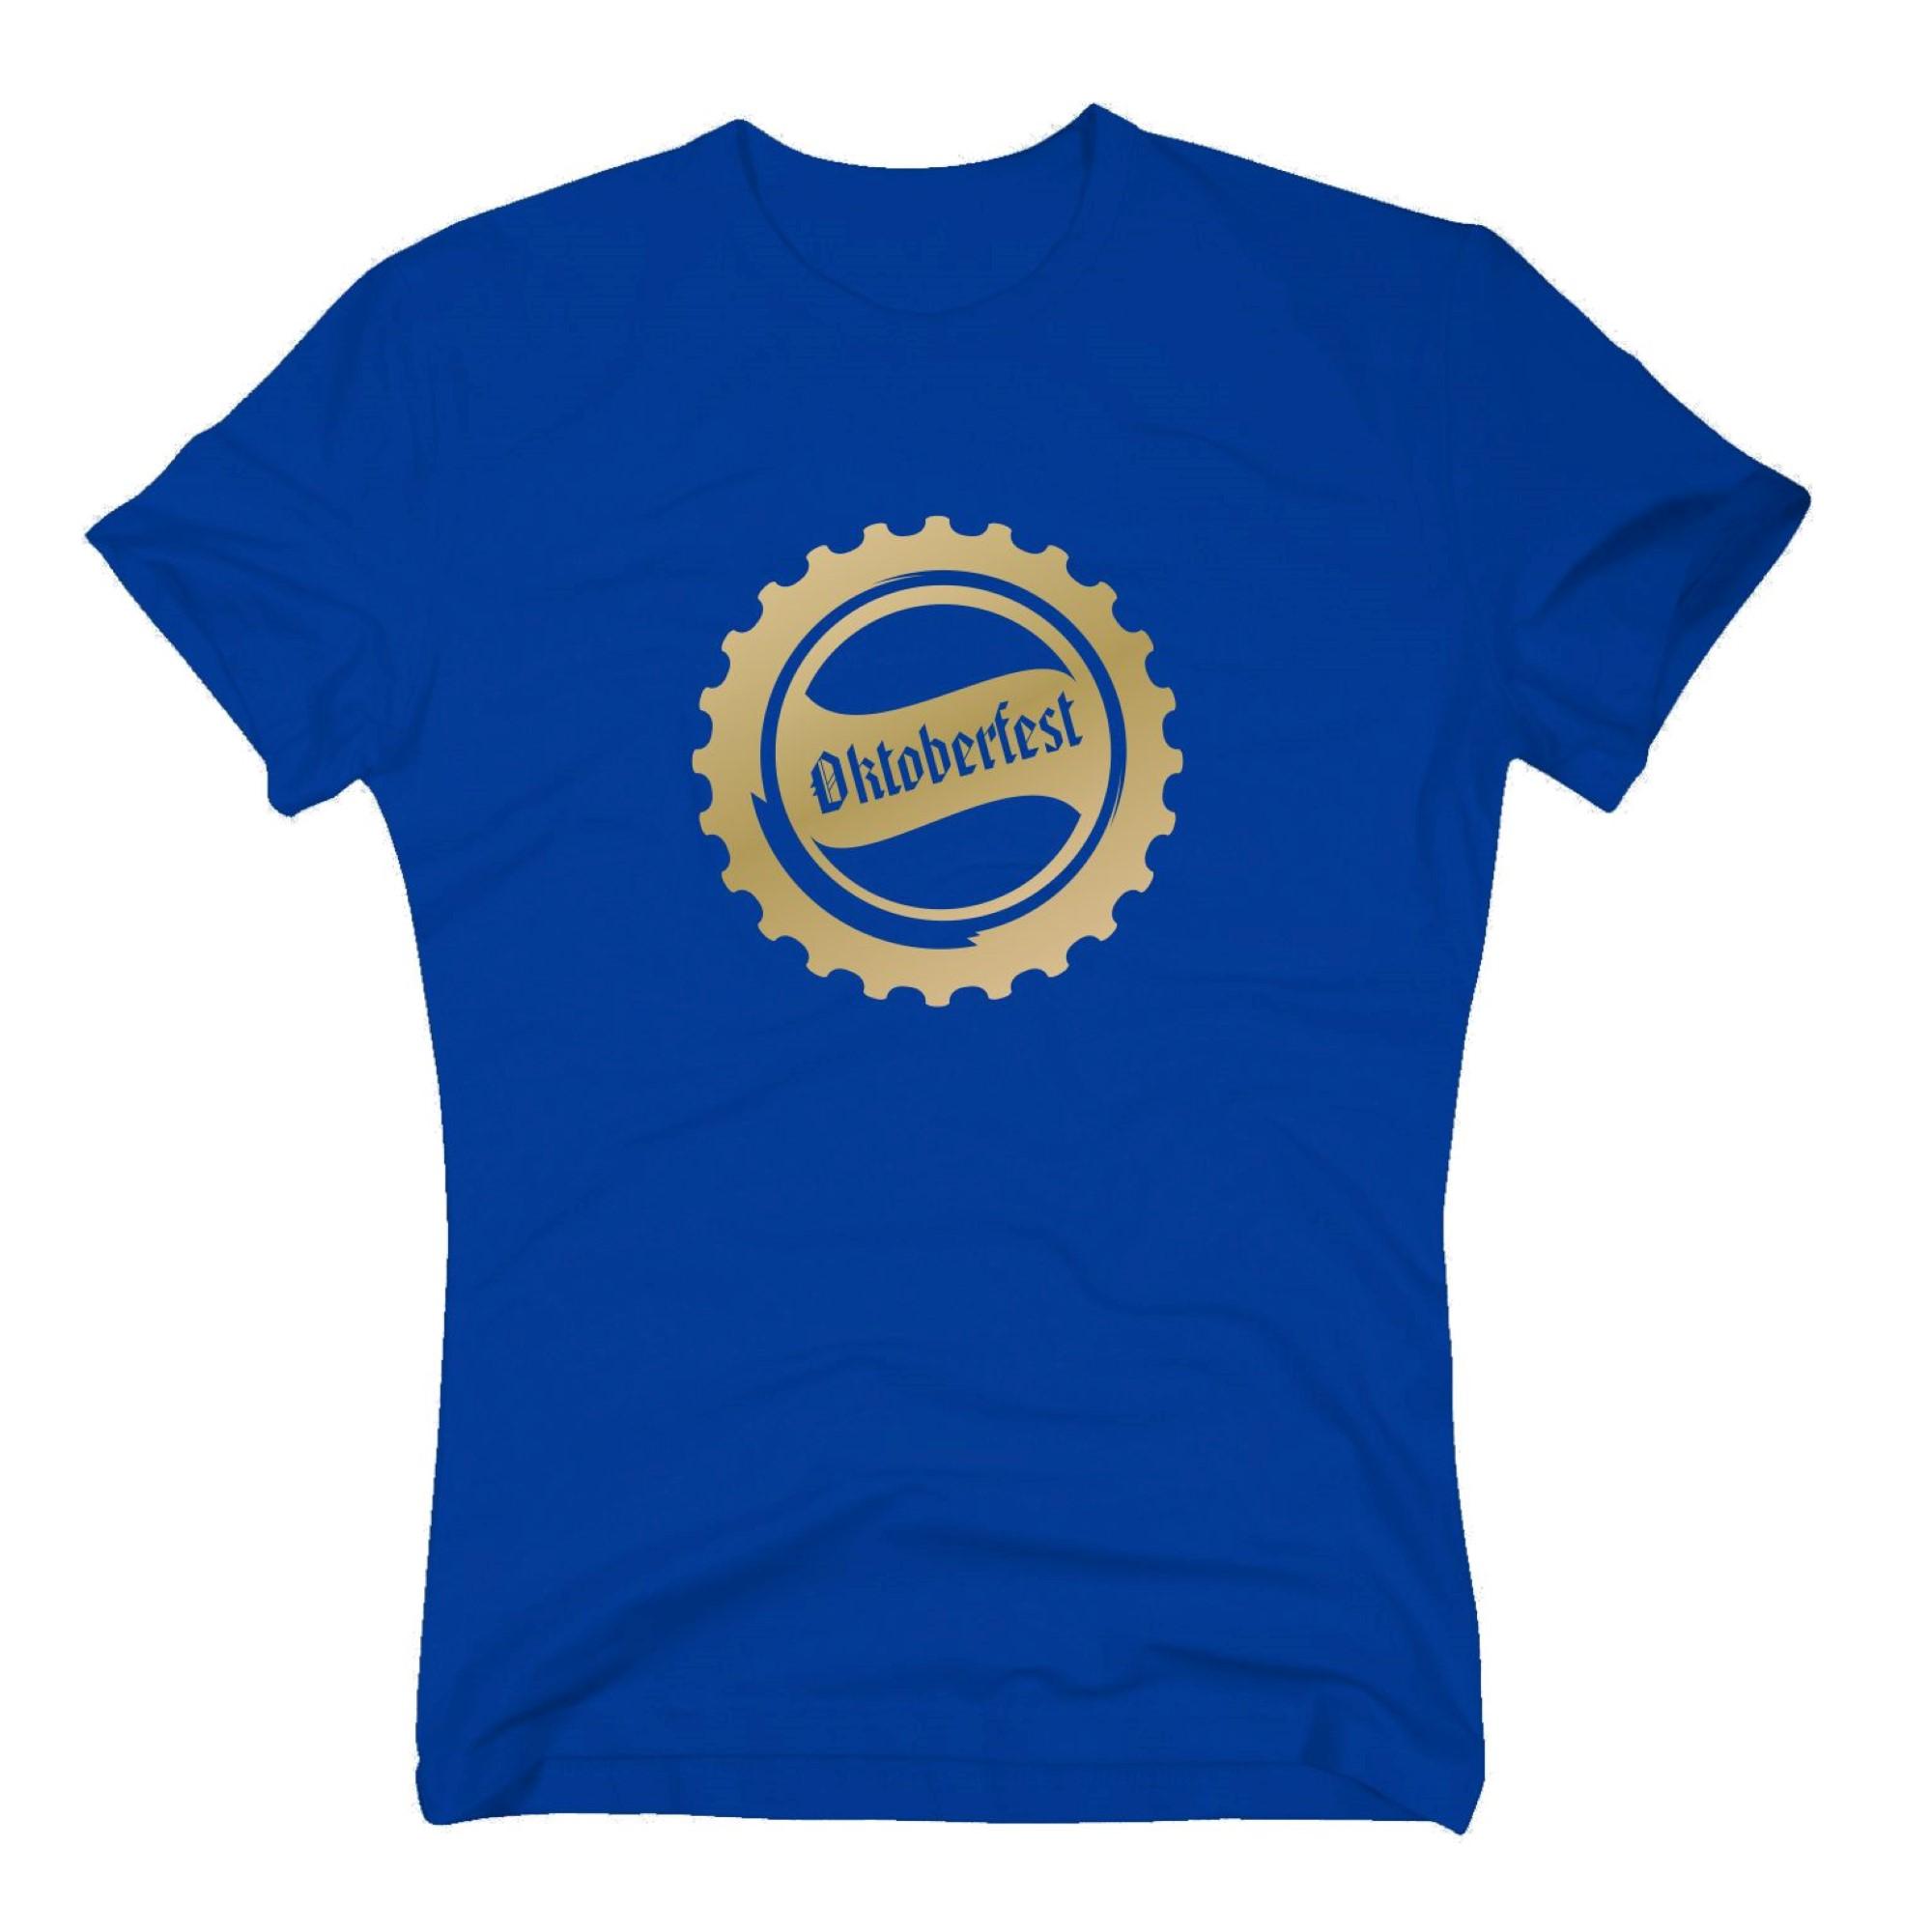 herren t-shirt - oktoberfest bierdeckel